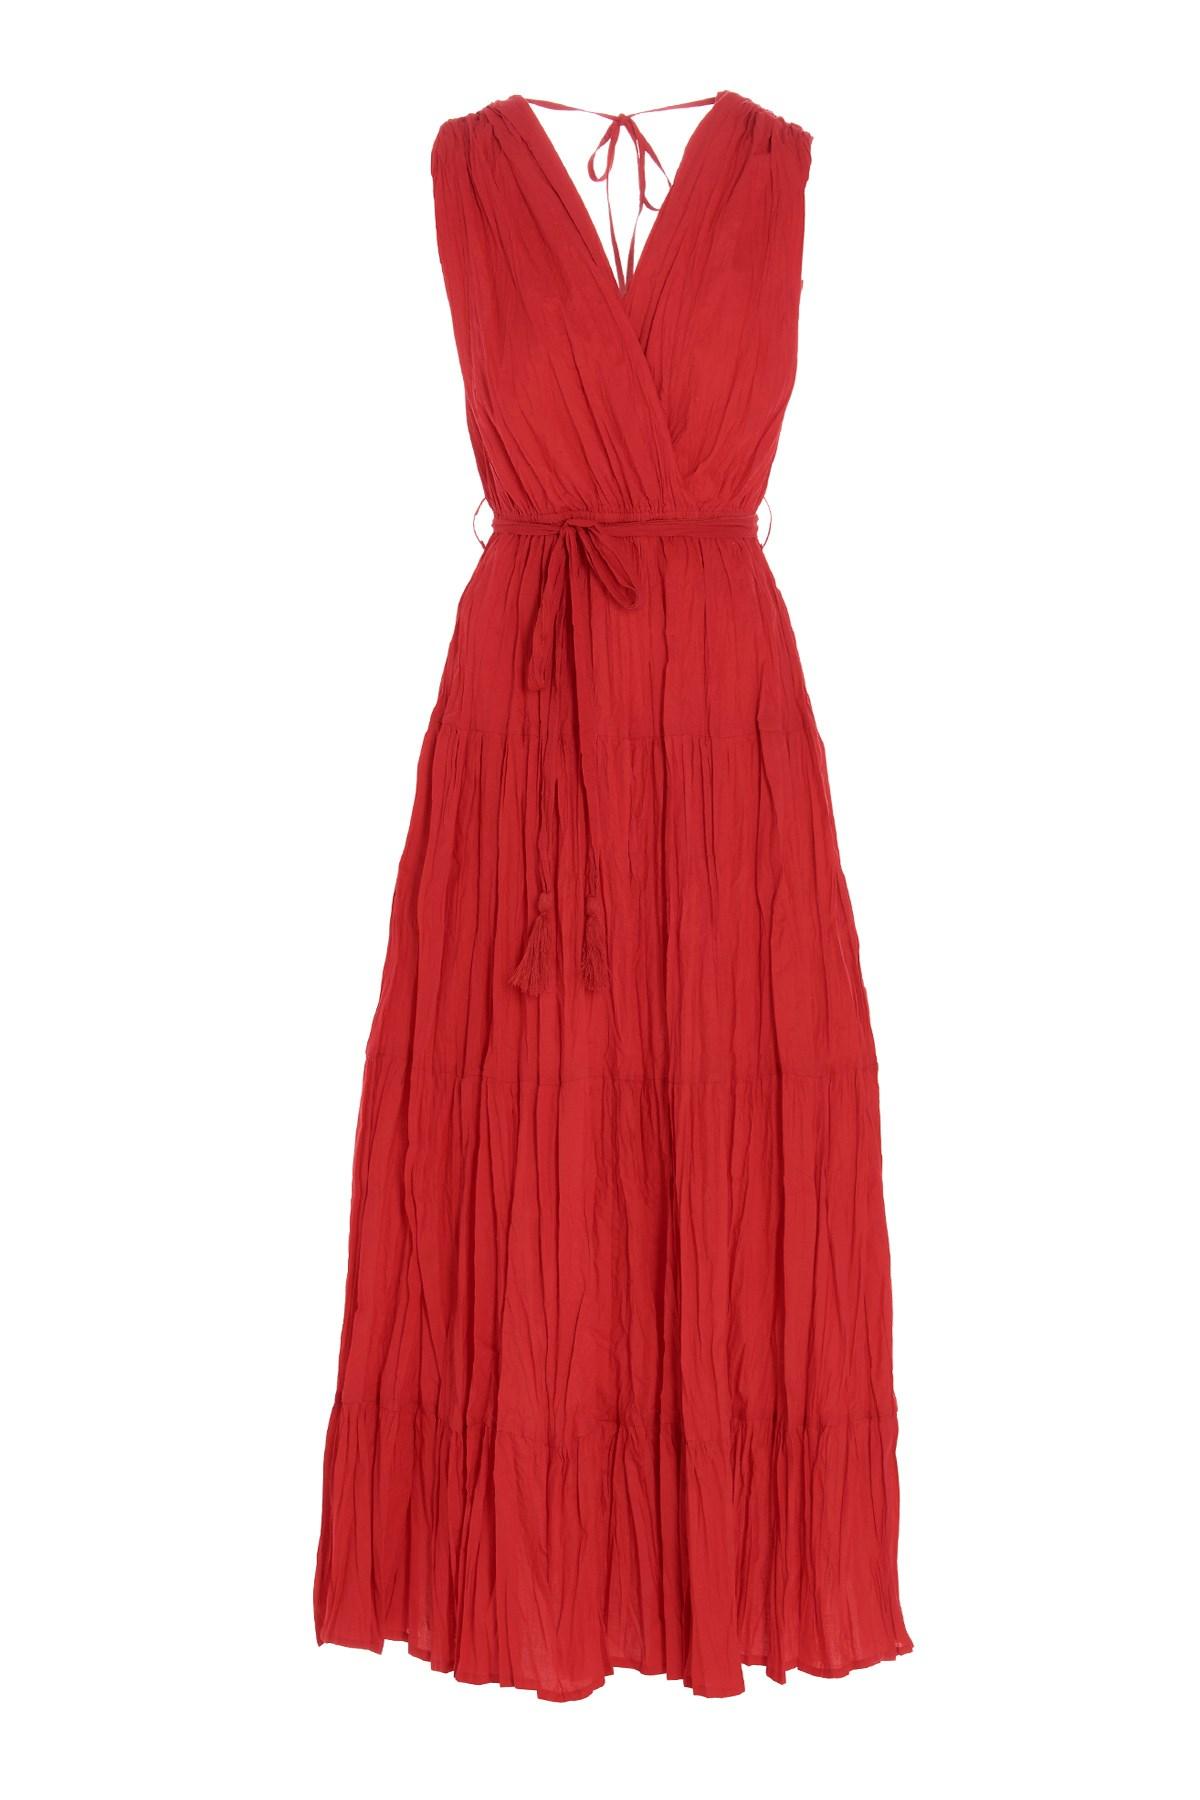 'Capode' dress